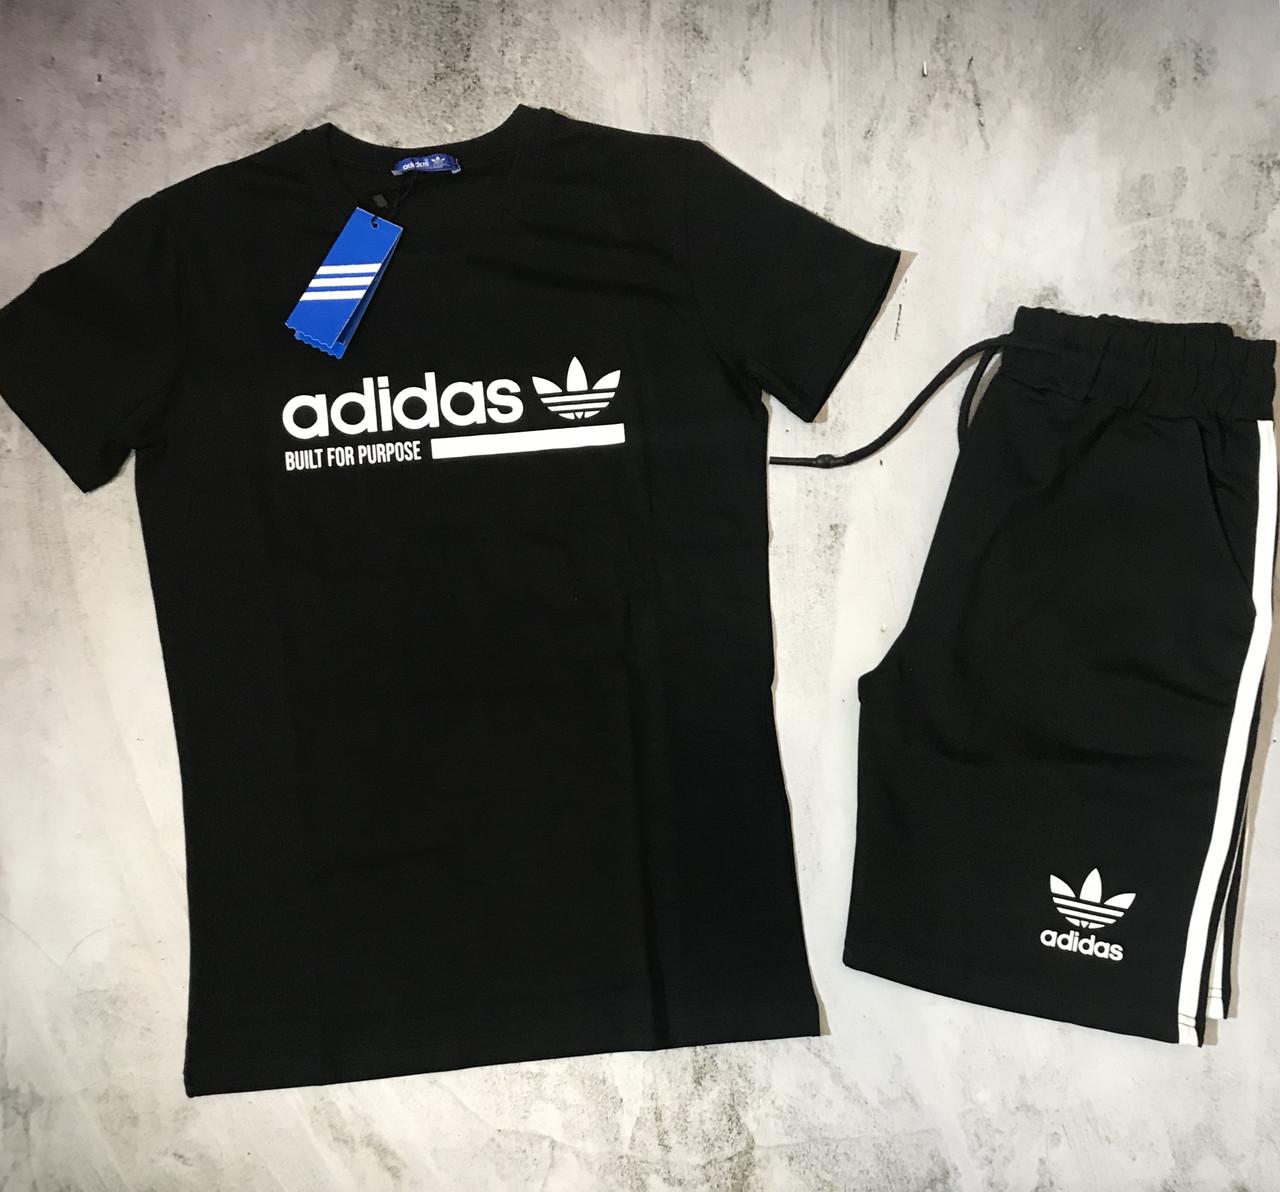 Мужской спортивный костюм (футболка и шорты) Adidas Unrivaled speed